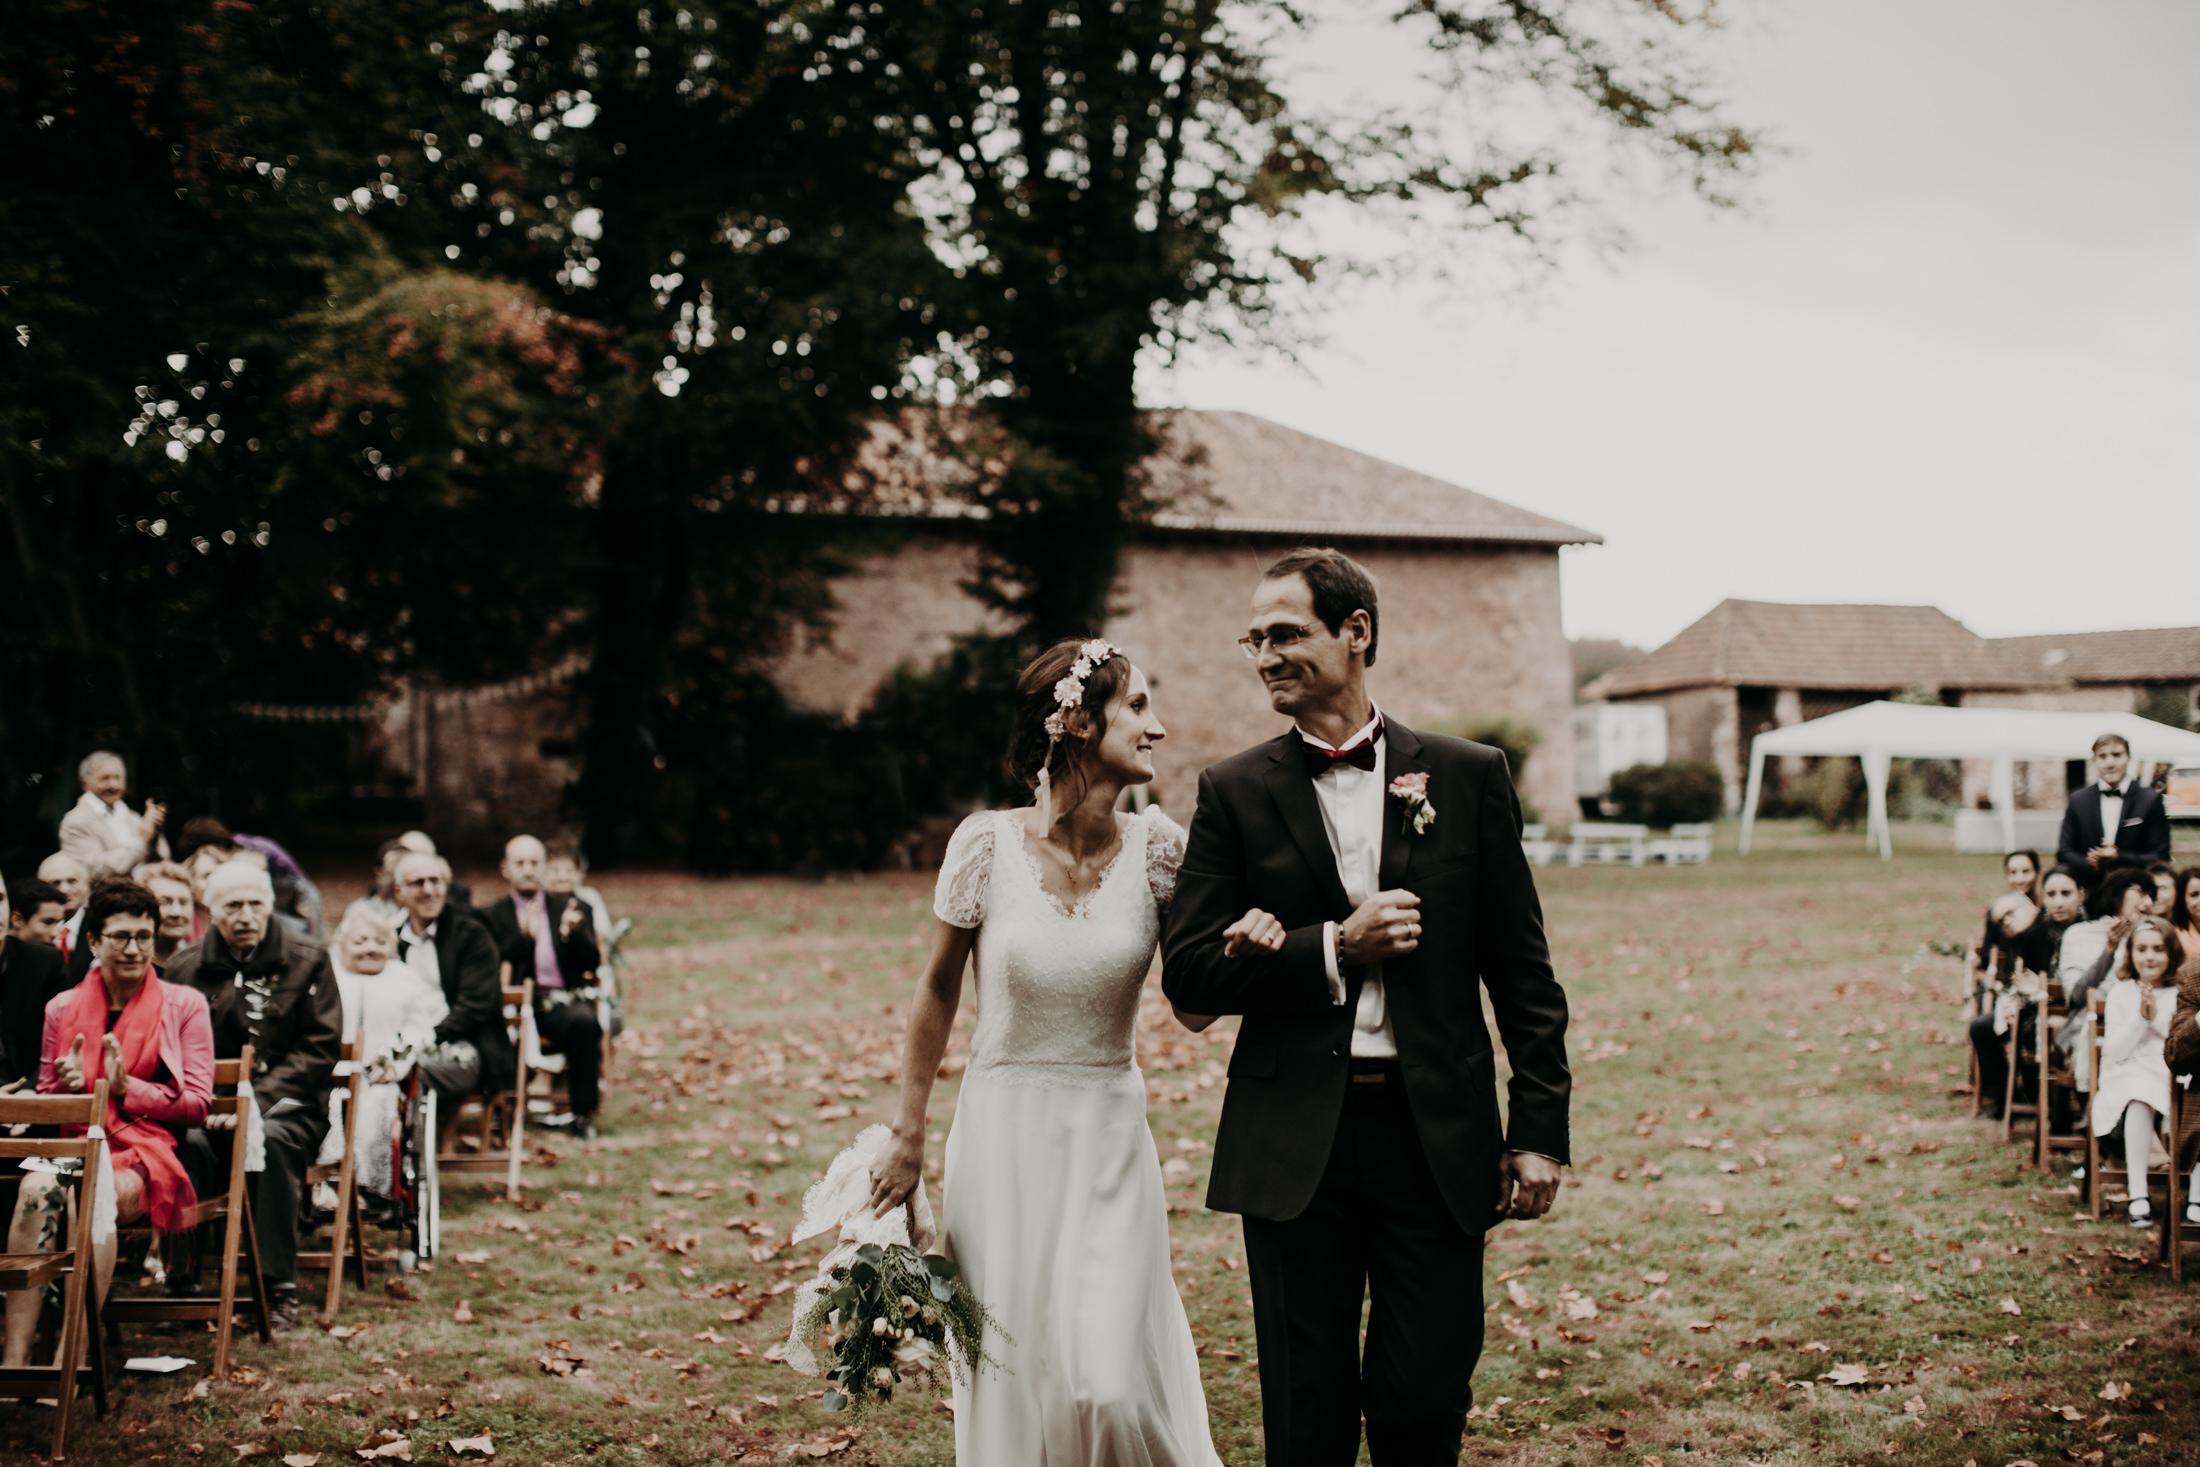 Mariage auvergne photographe wedding_-48.jpg